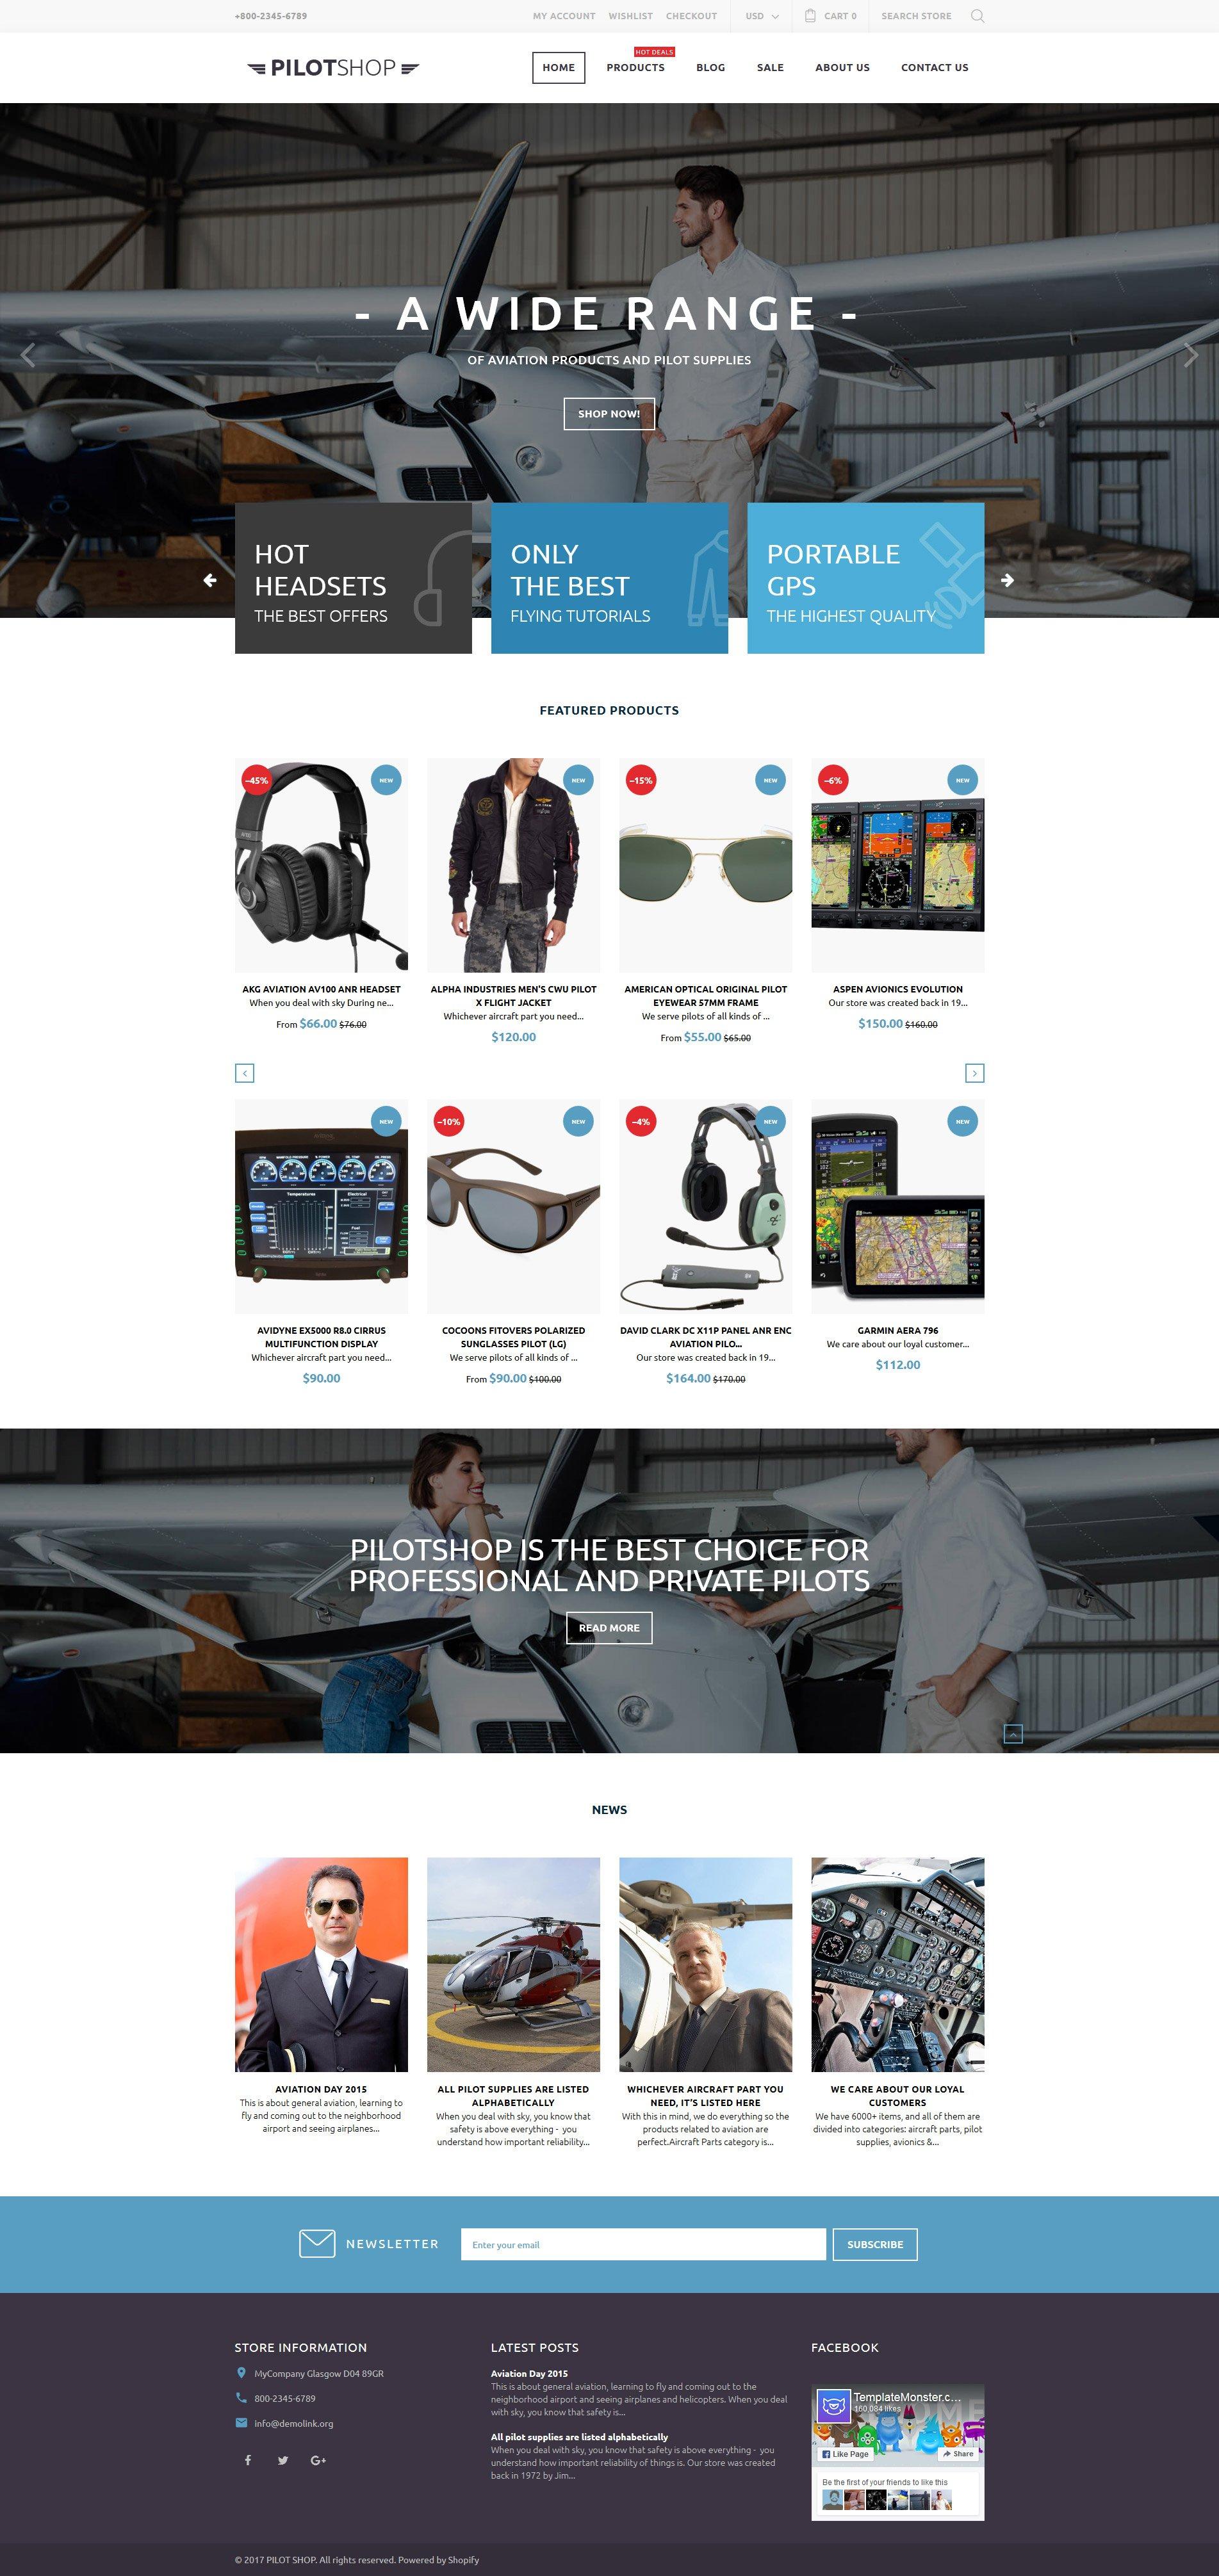 PilotShop - Pilot Supplies Responsive Shopify Theme